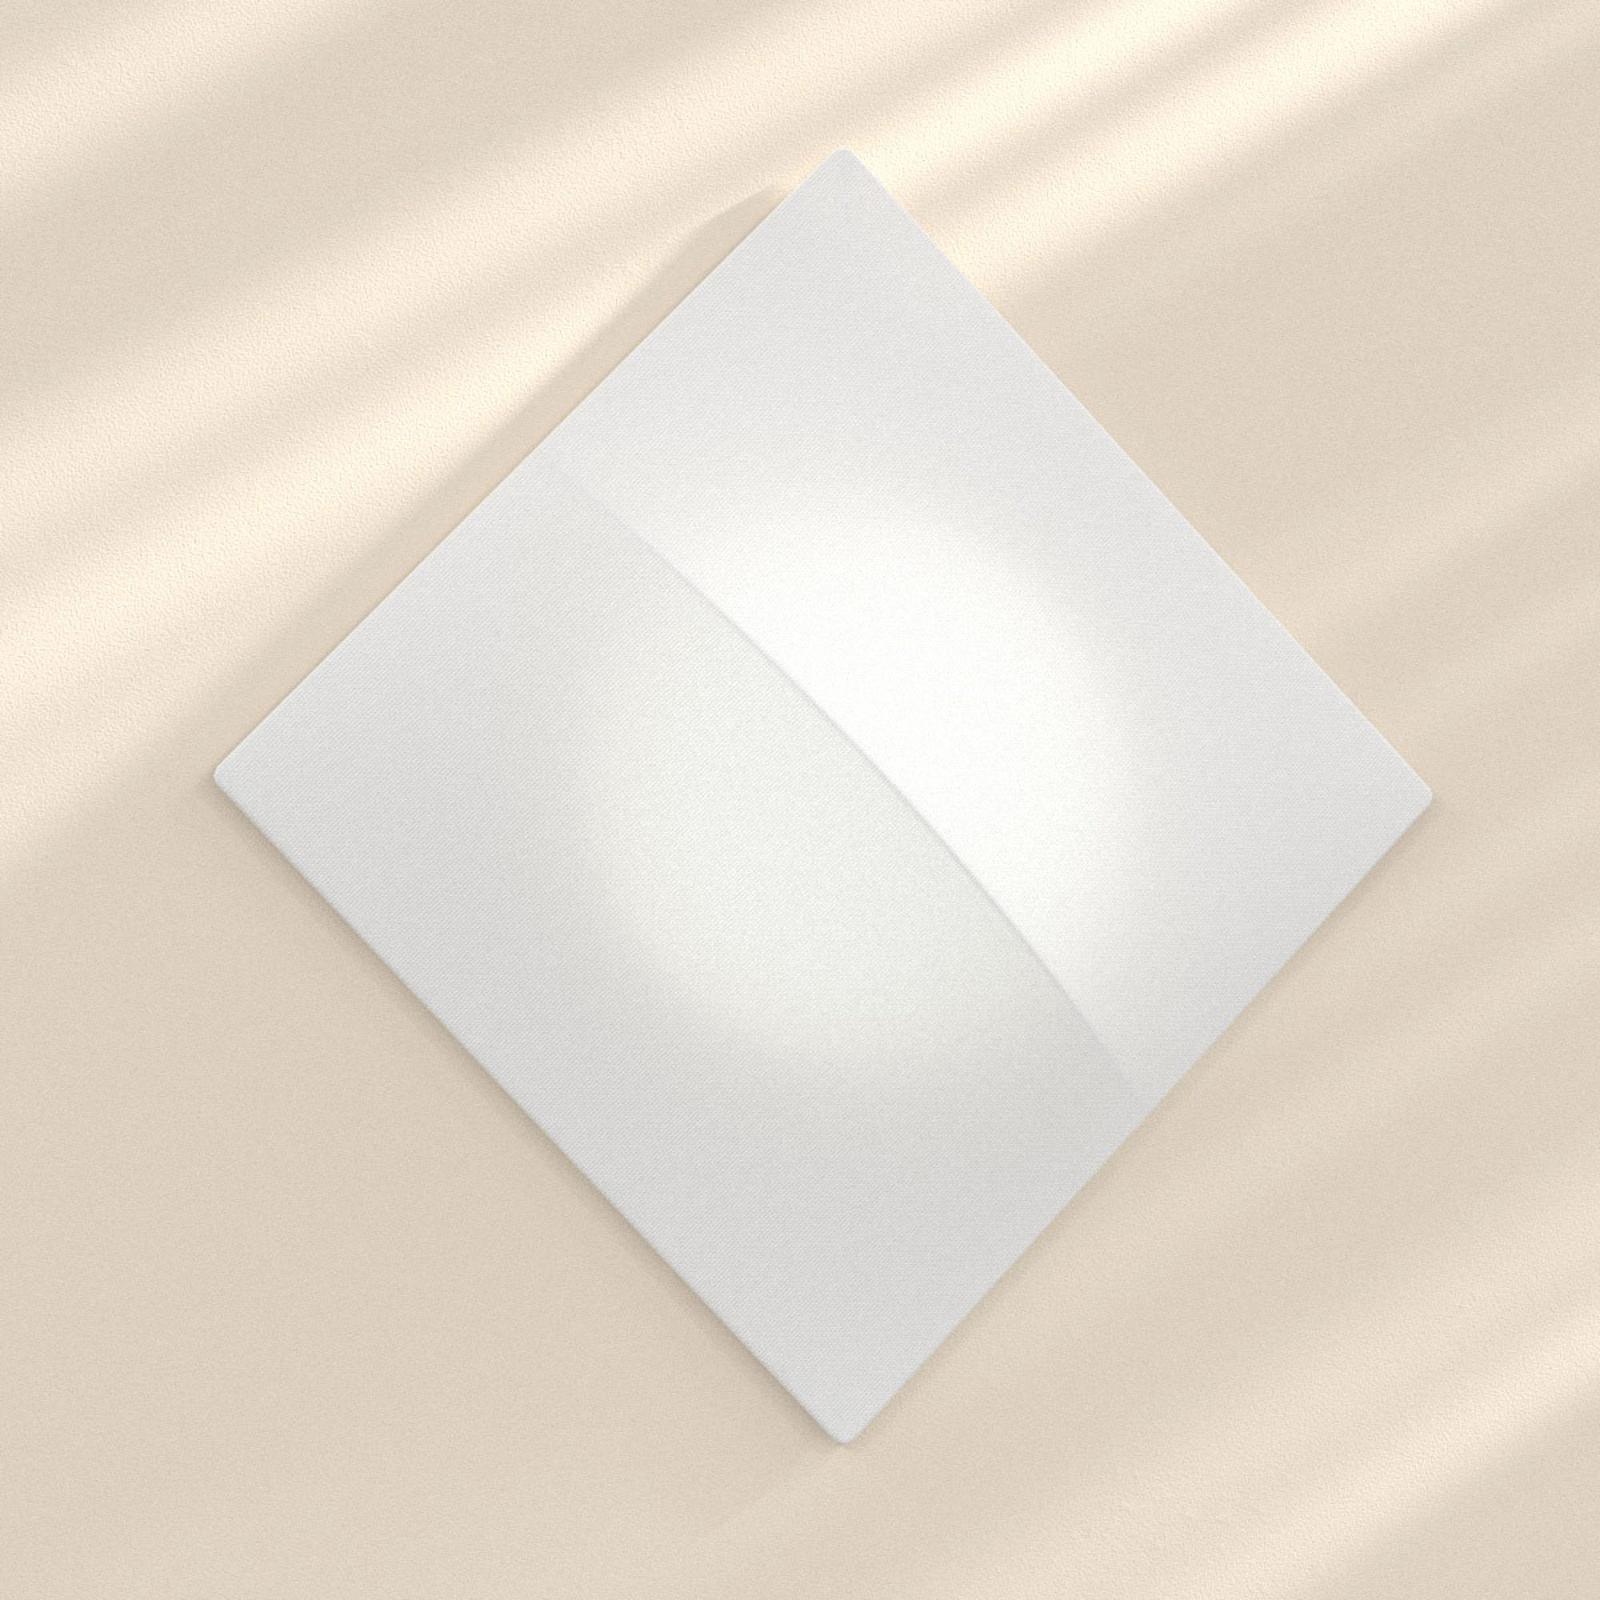 Nelly S - vierkante wandlamp met stof 100 cm